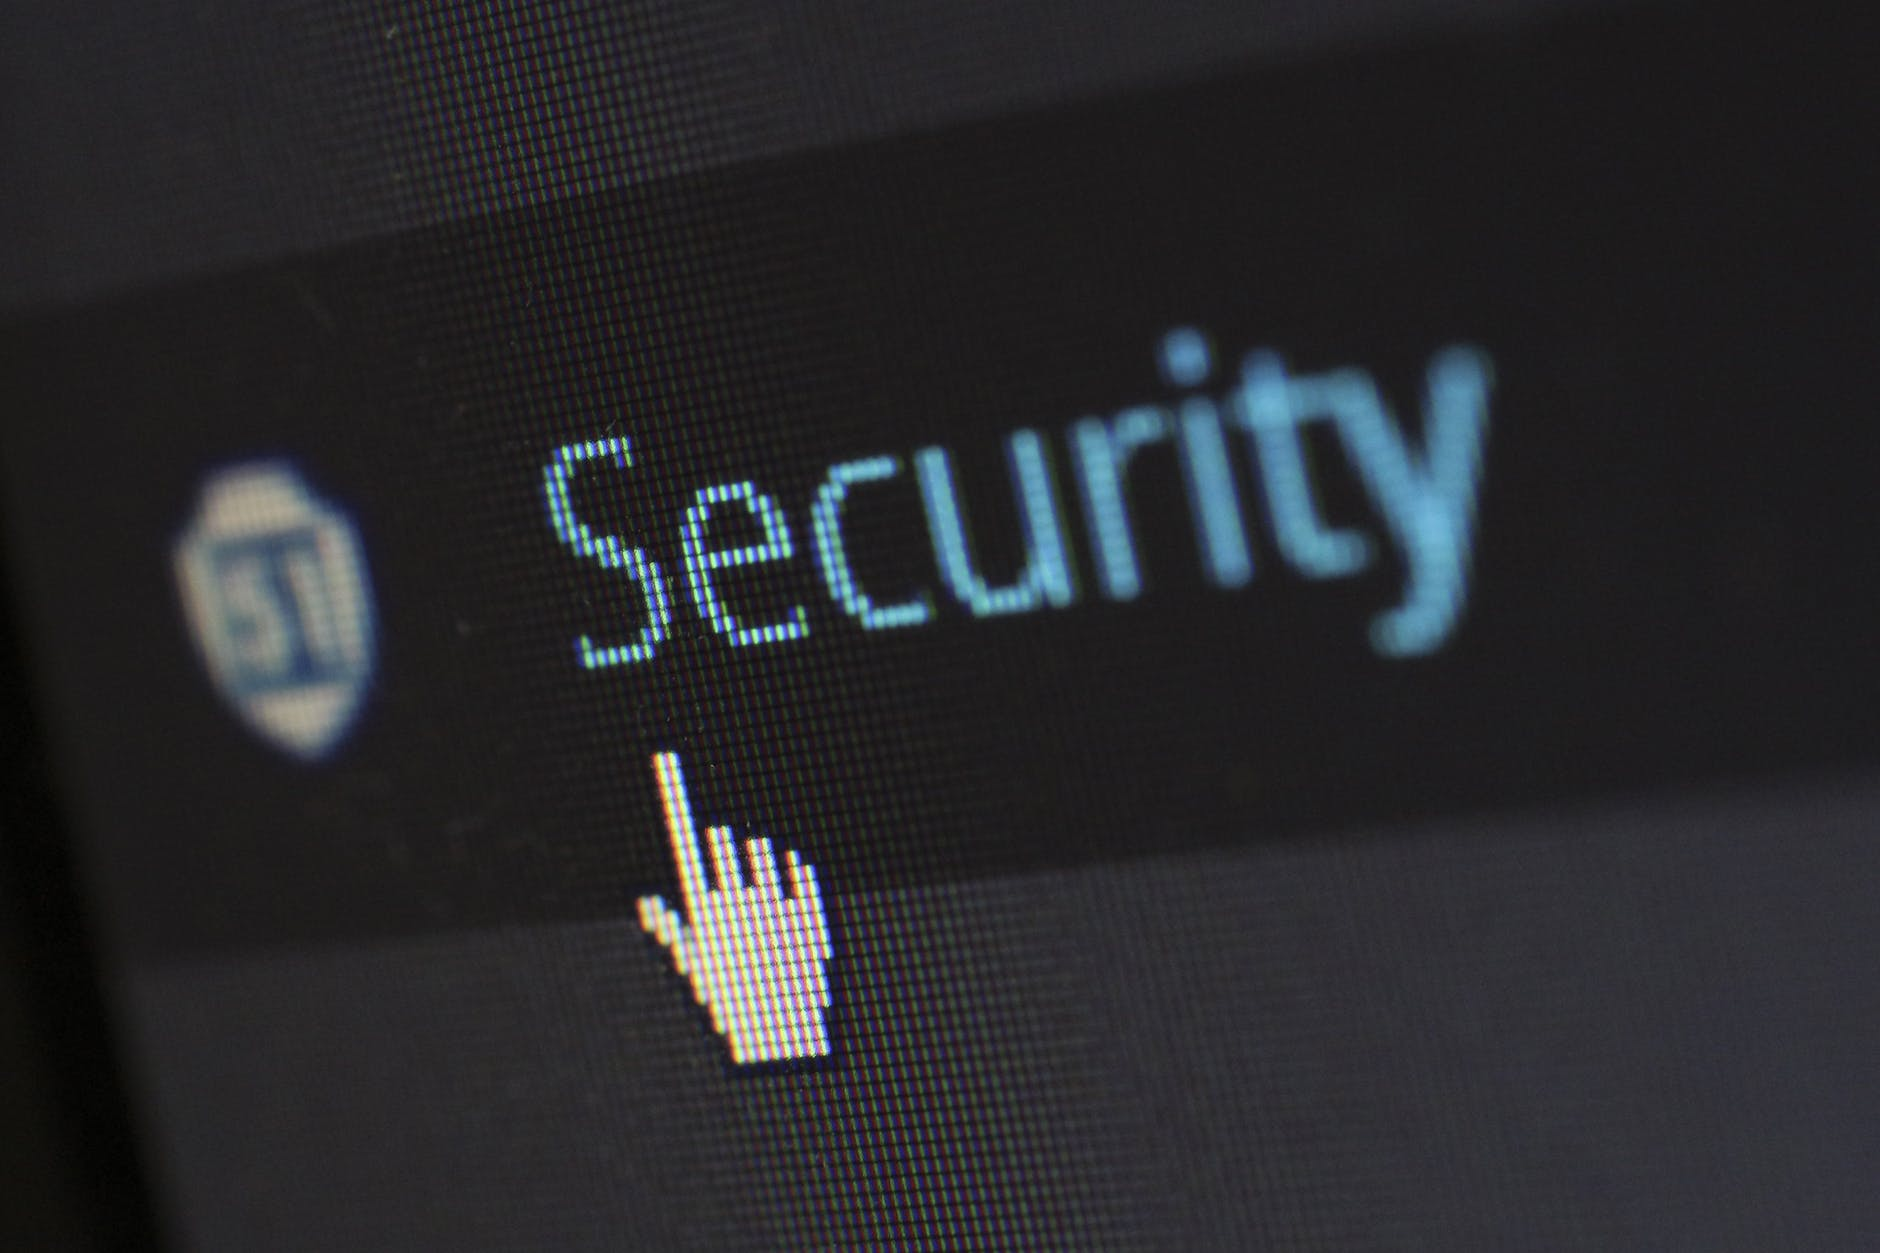 security pexel